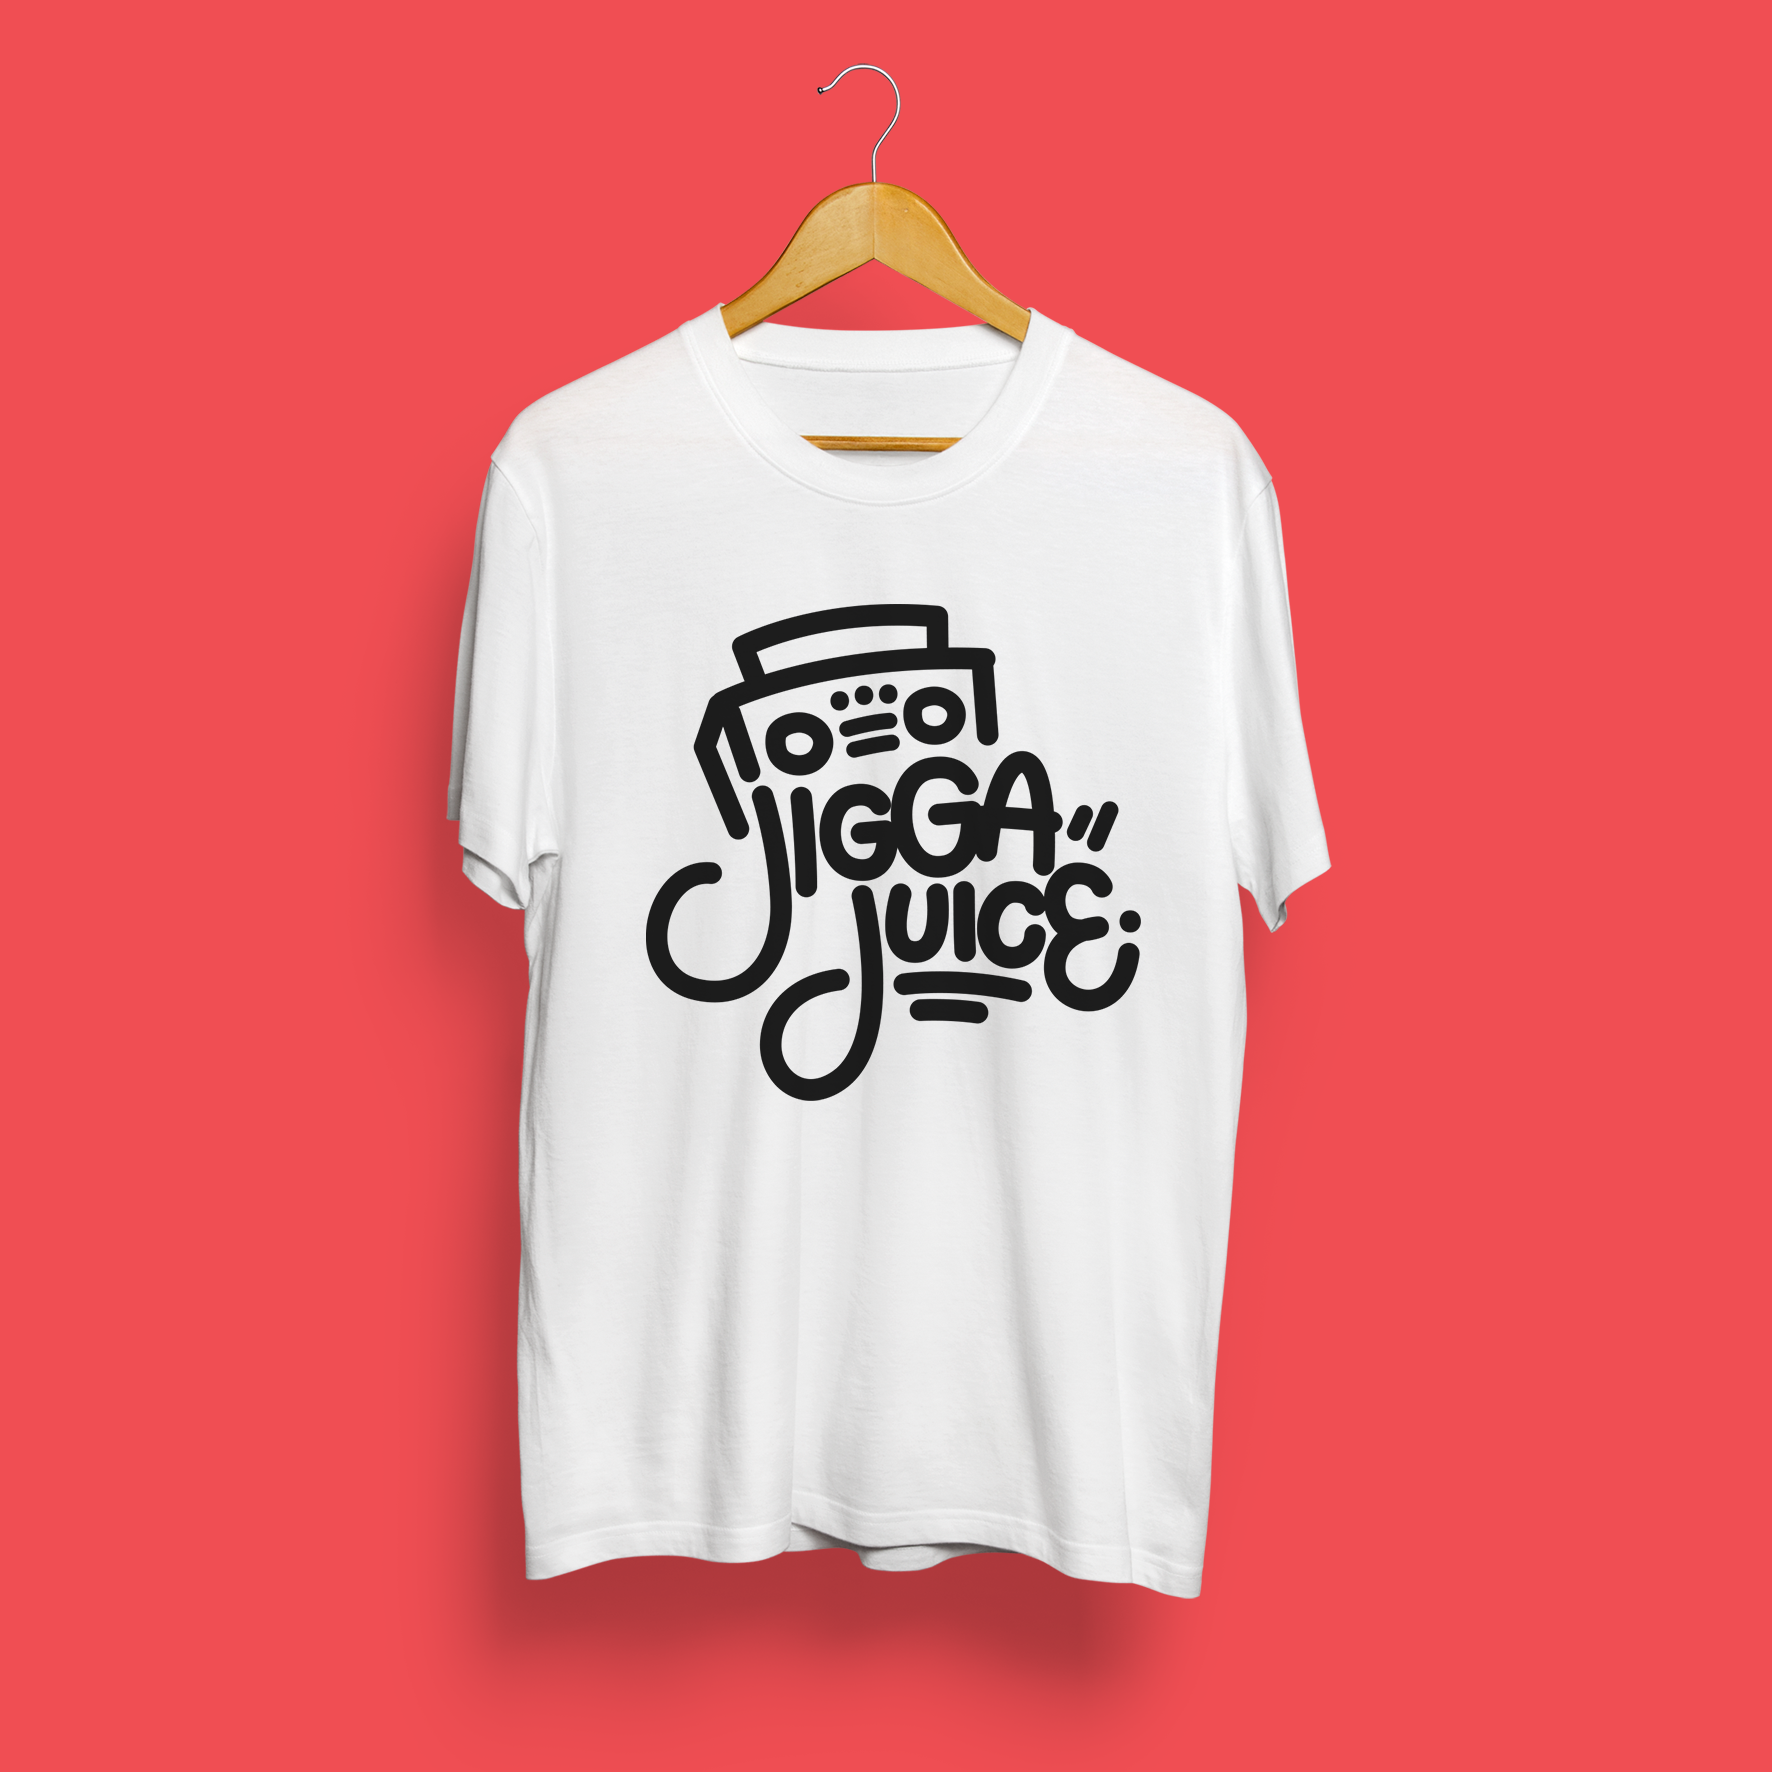 Jigga Juice - New T-Shirt